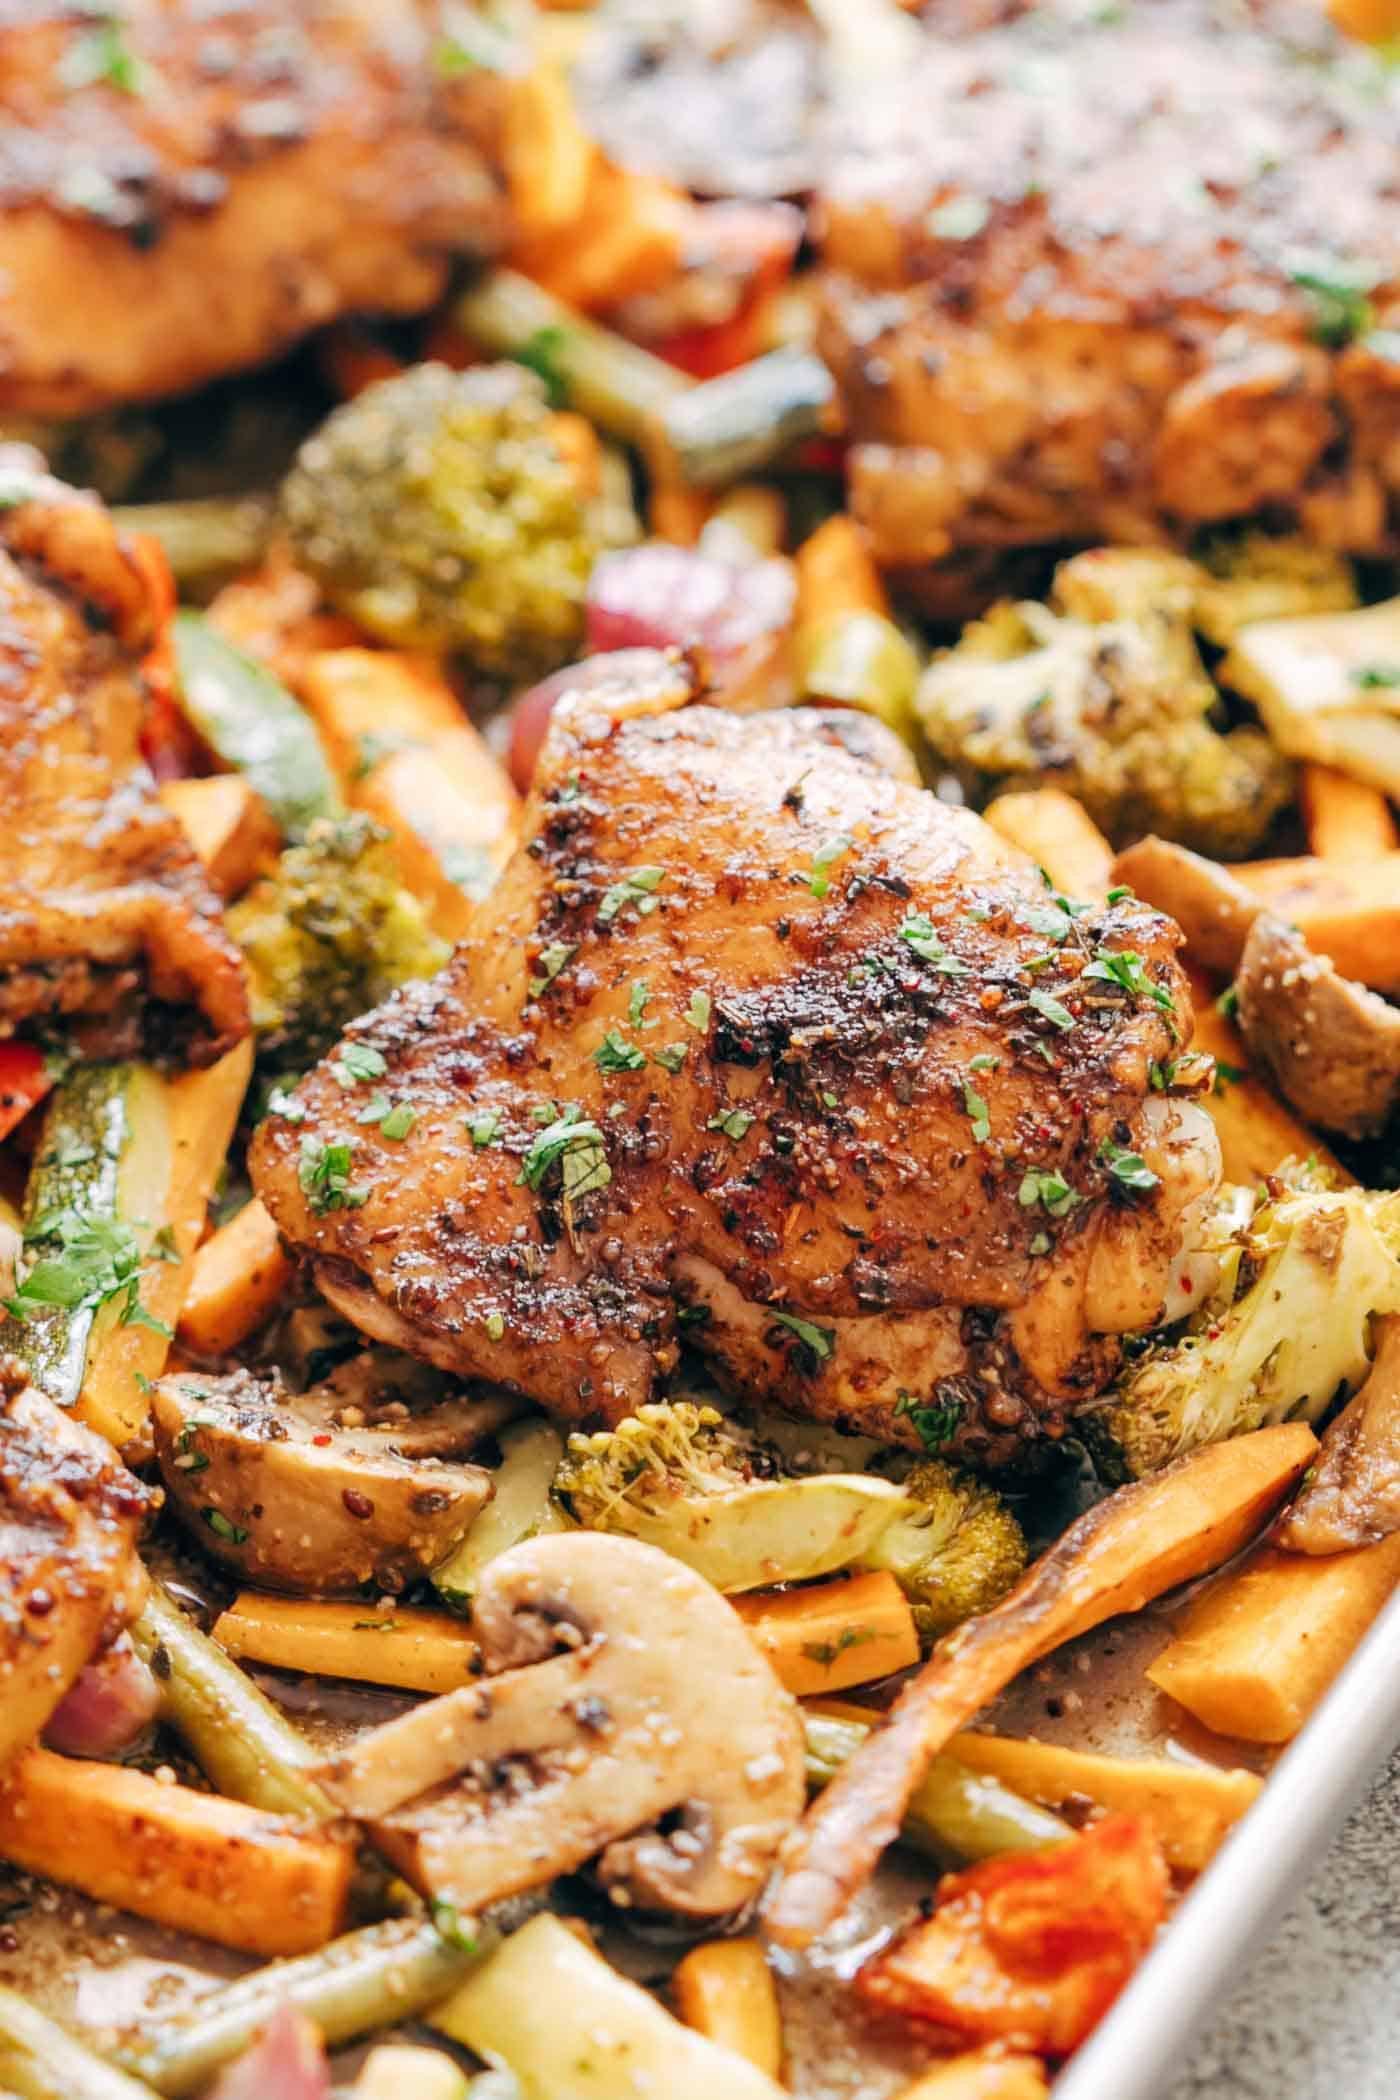 Sheet Pan Dinners Chicken Thighs  Sheet Pan Honey Balsamic Chicken Thighs with Veggies